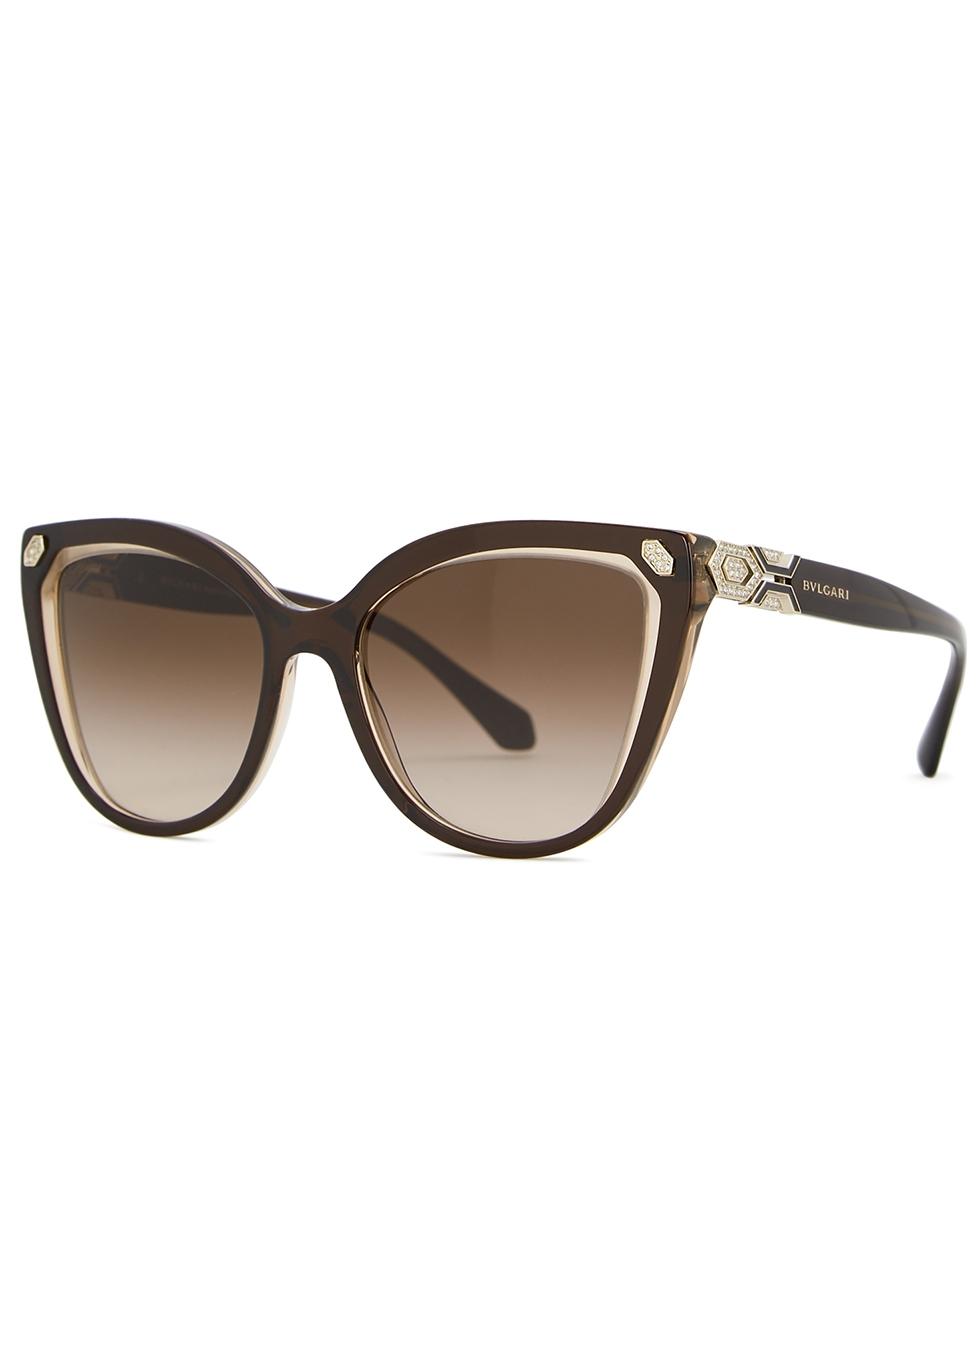 Brown crystal-embellished cat-eye sunglasses - BVLGARI